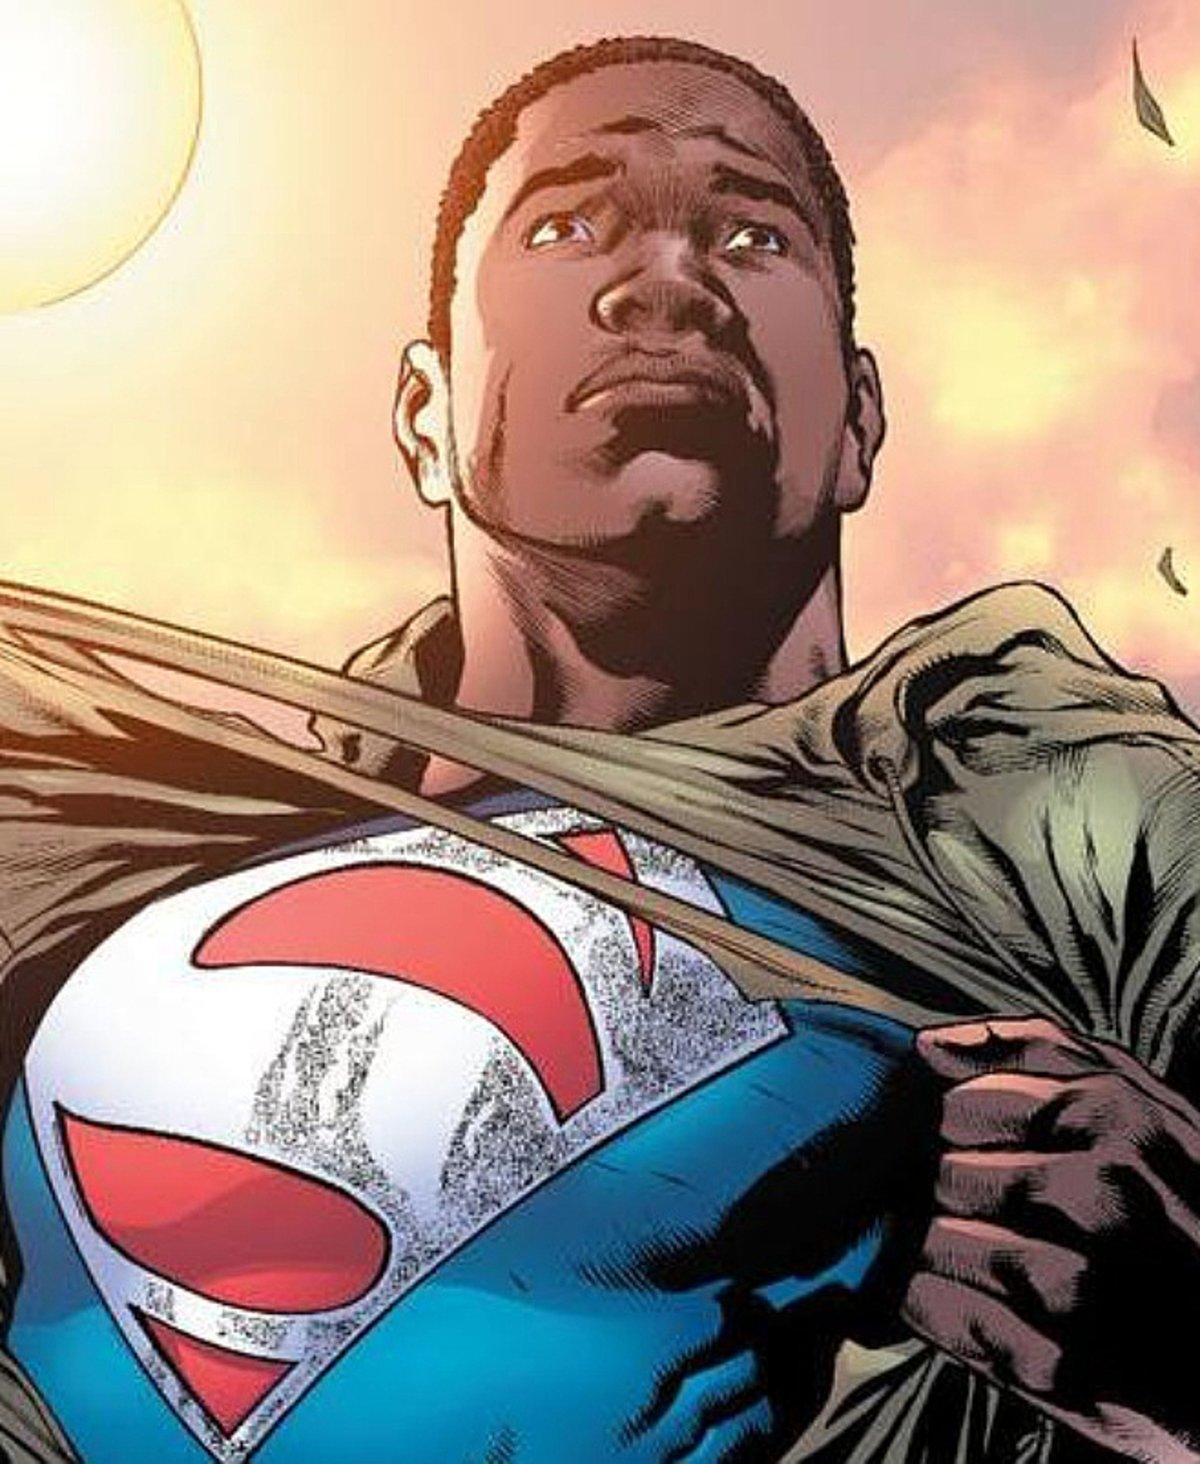 Henry Cavill oder erster Schwarzer Man of Steel? J.J. Abrams produziert neuen Superman-DC-Film